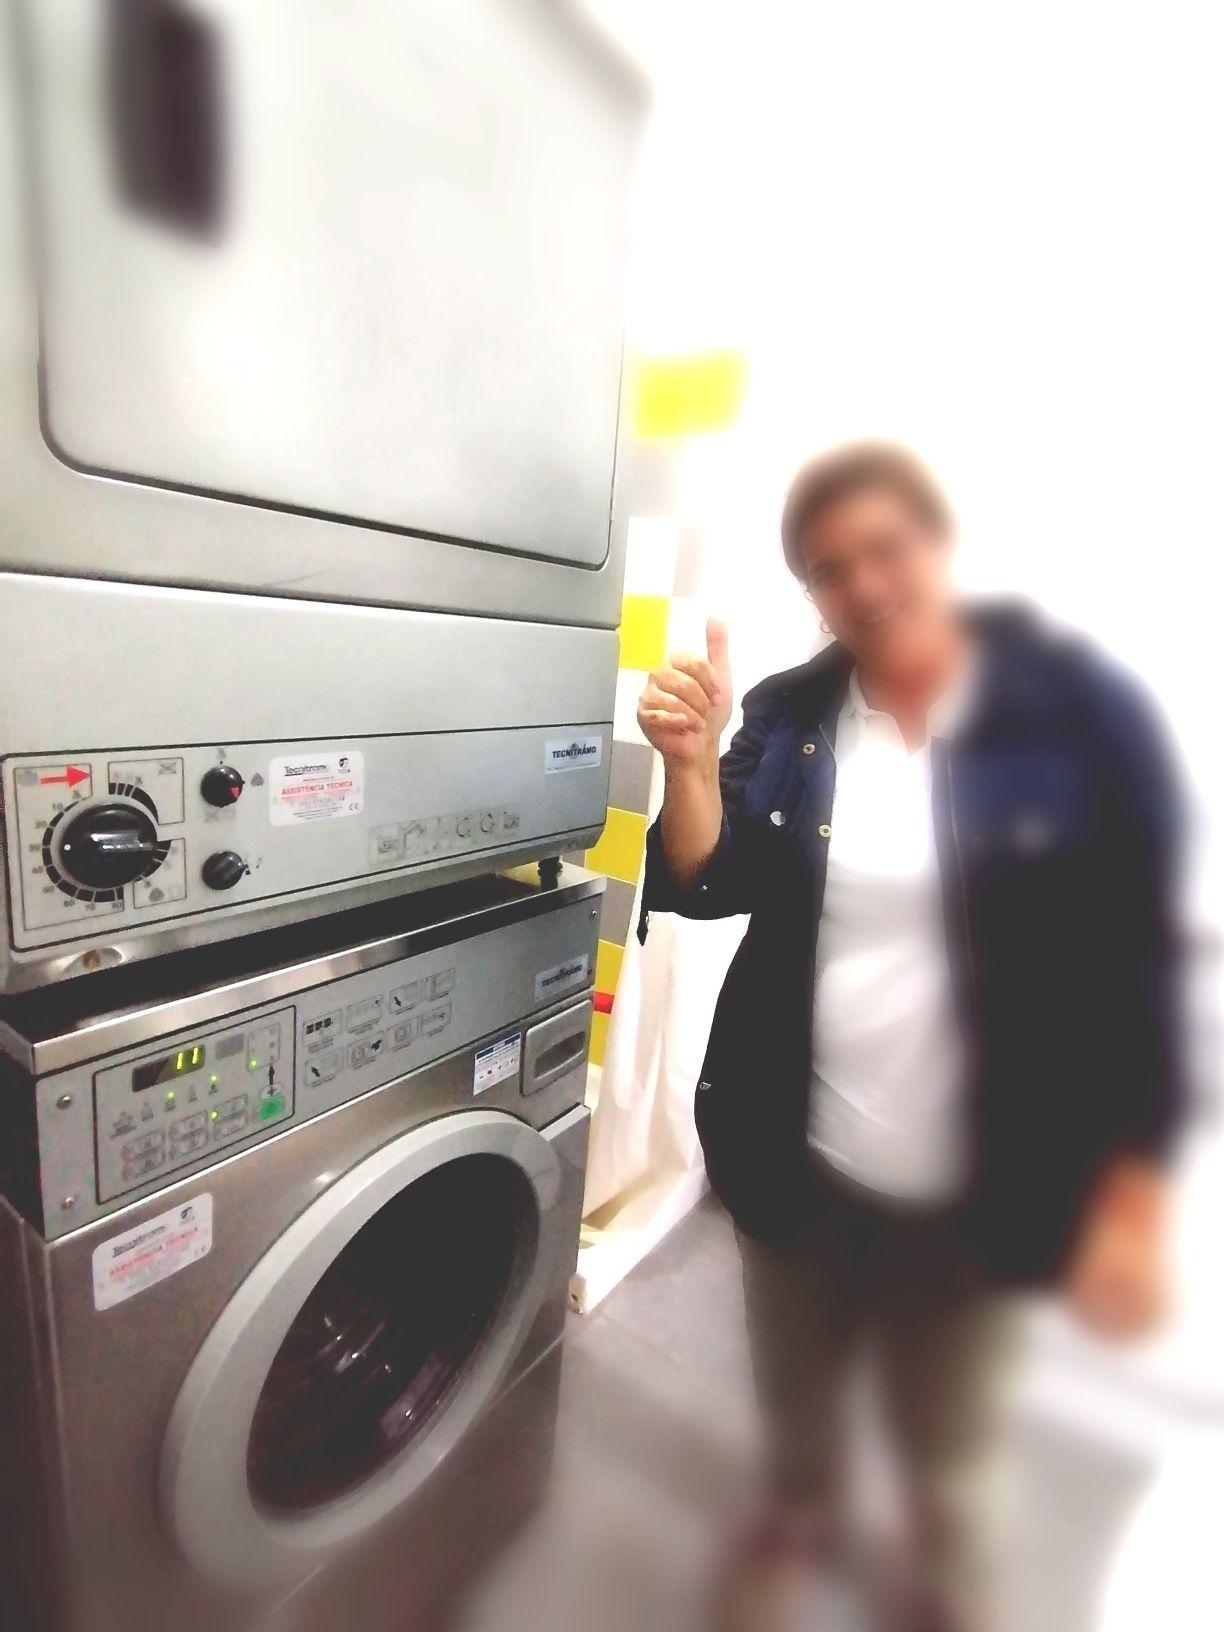 Alojamento local lavandaria industriais e self service